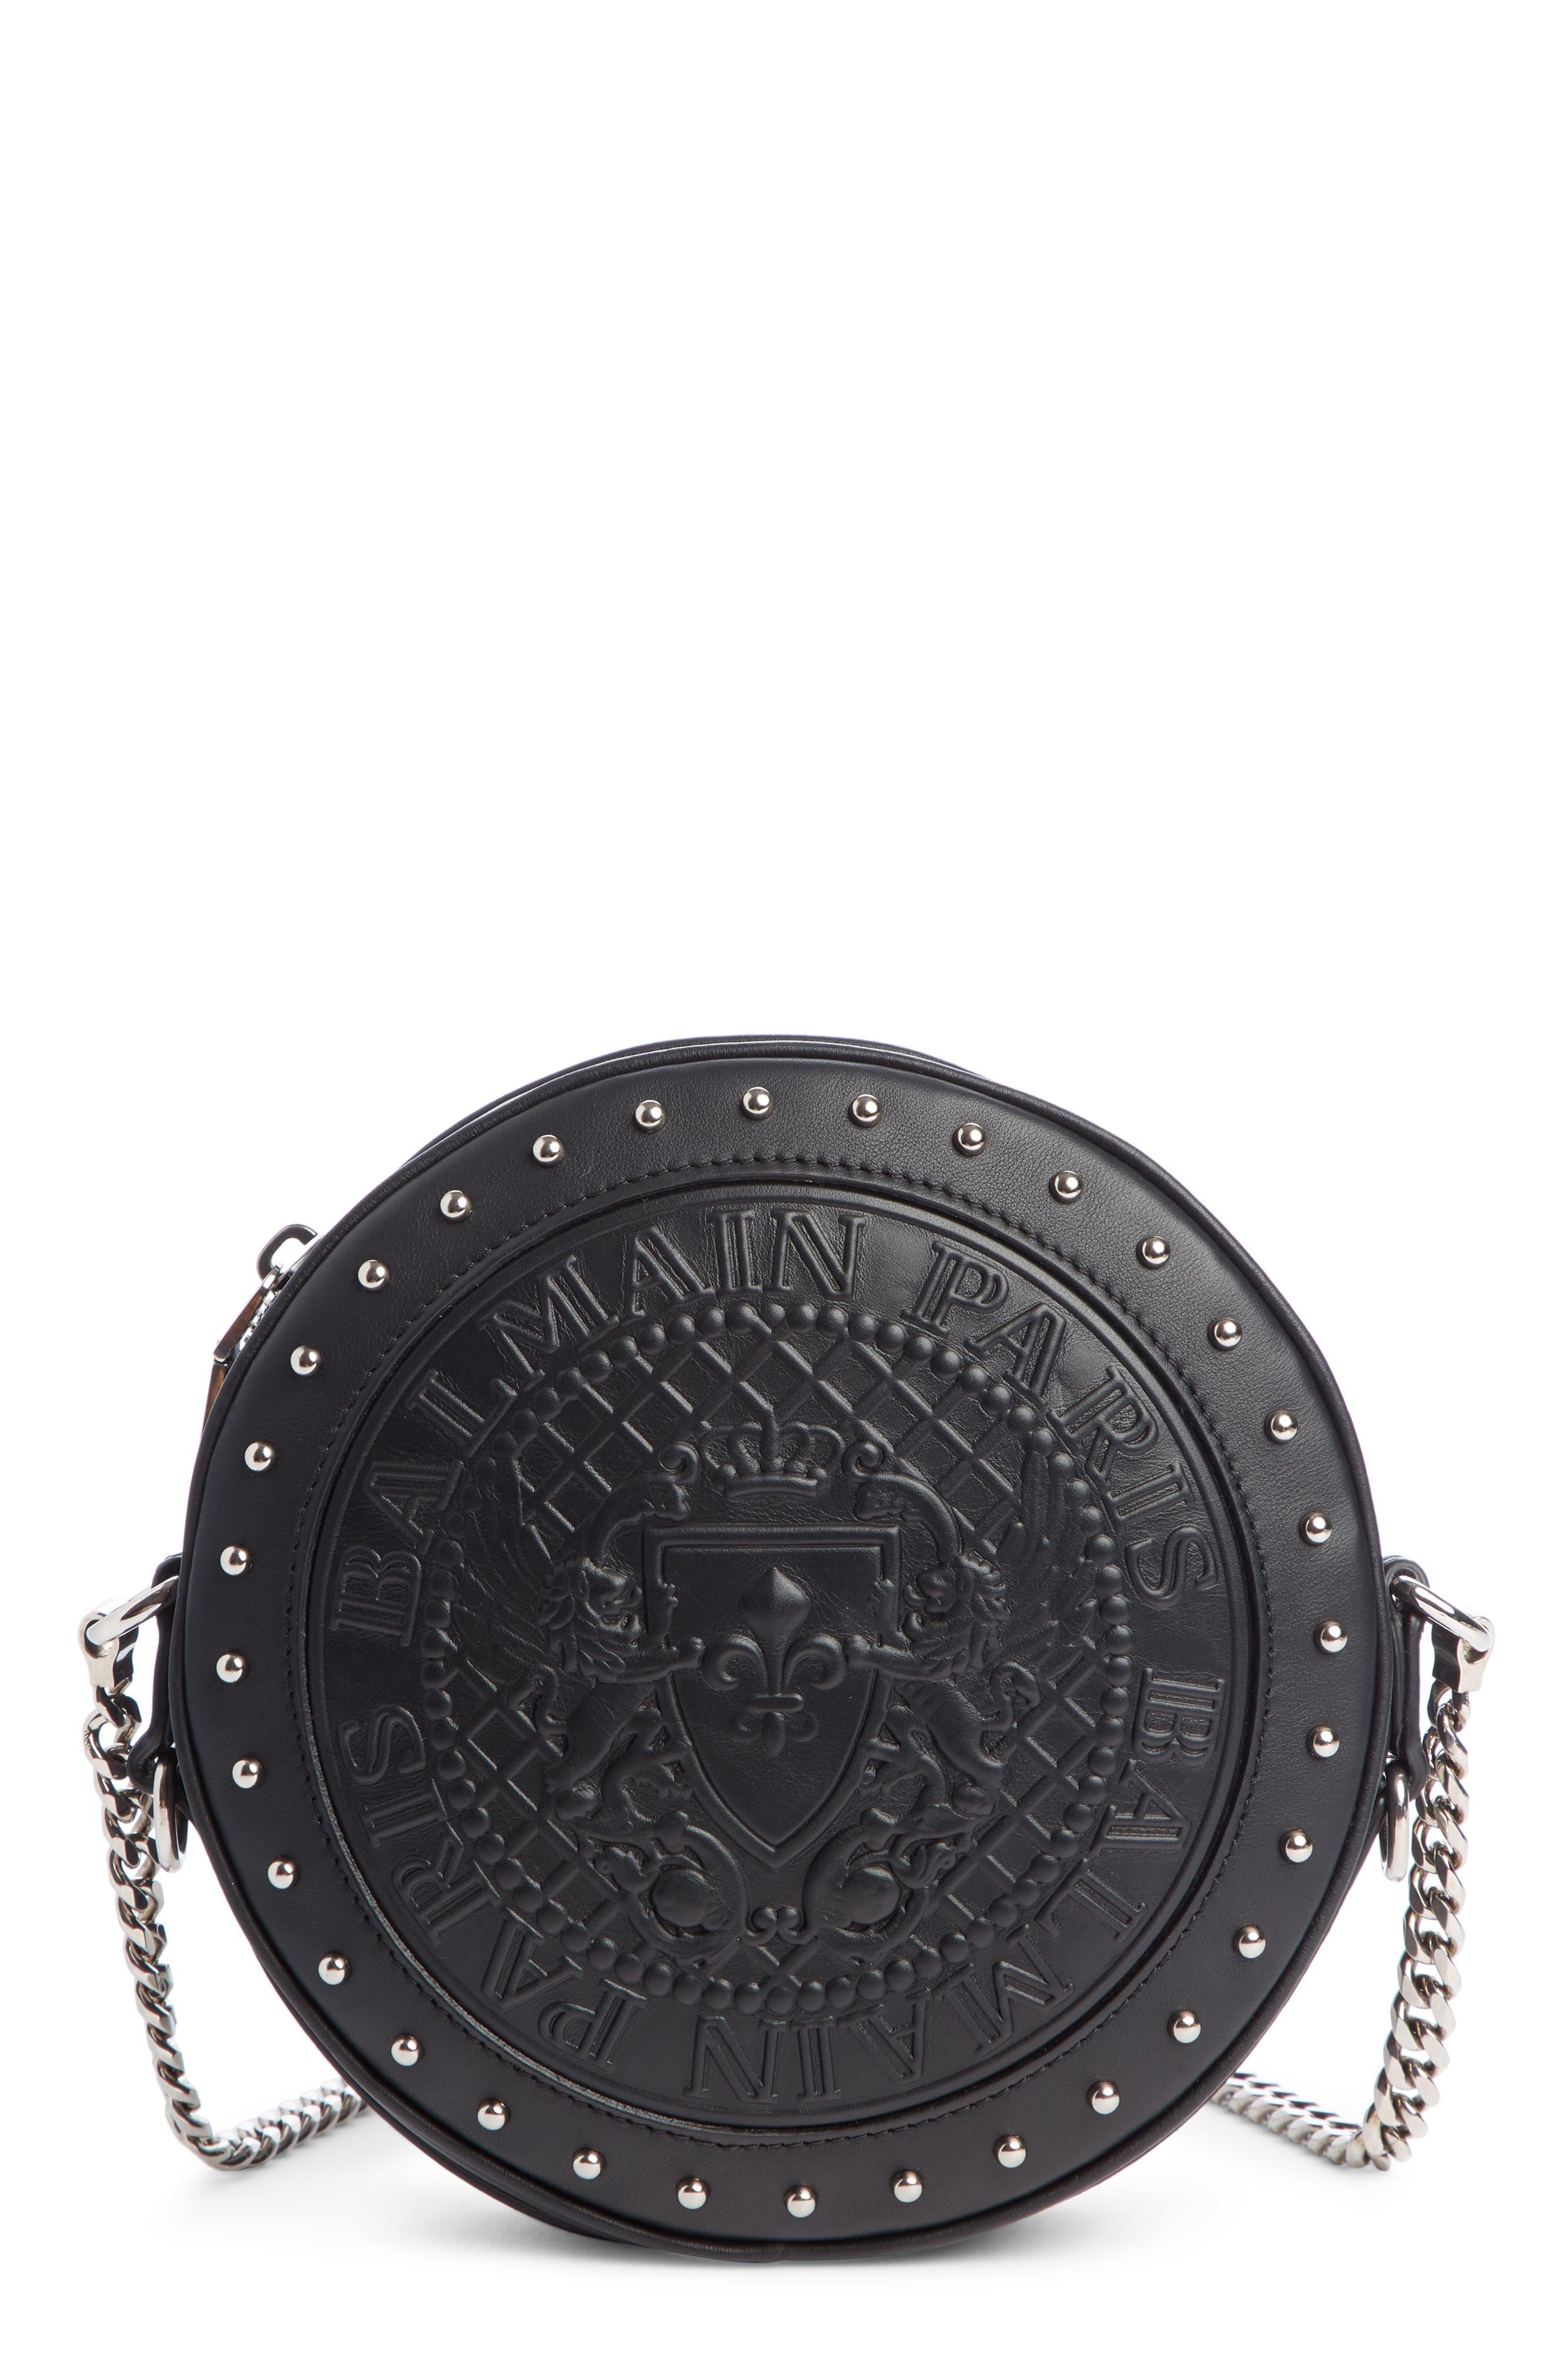 BALMAIN Disco Embossed Calfskin Leather Crossbody Bag, Main, color, NOIR